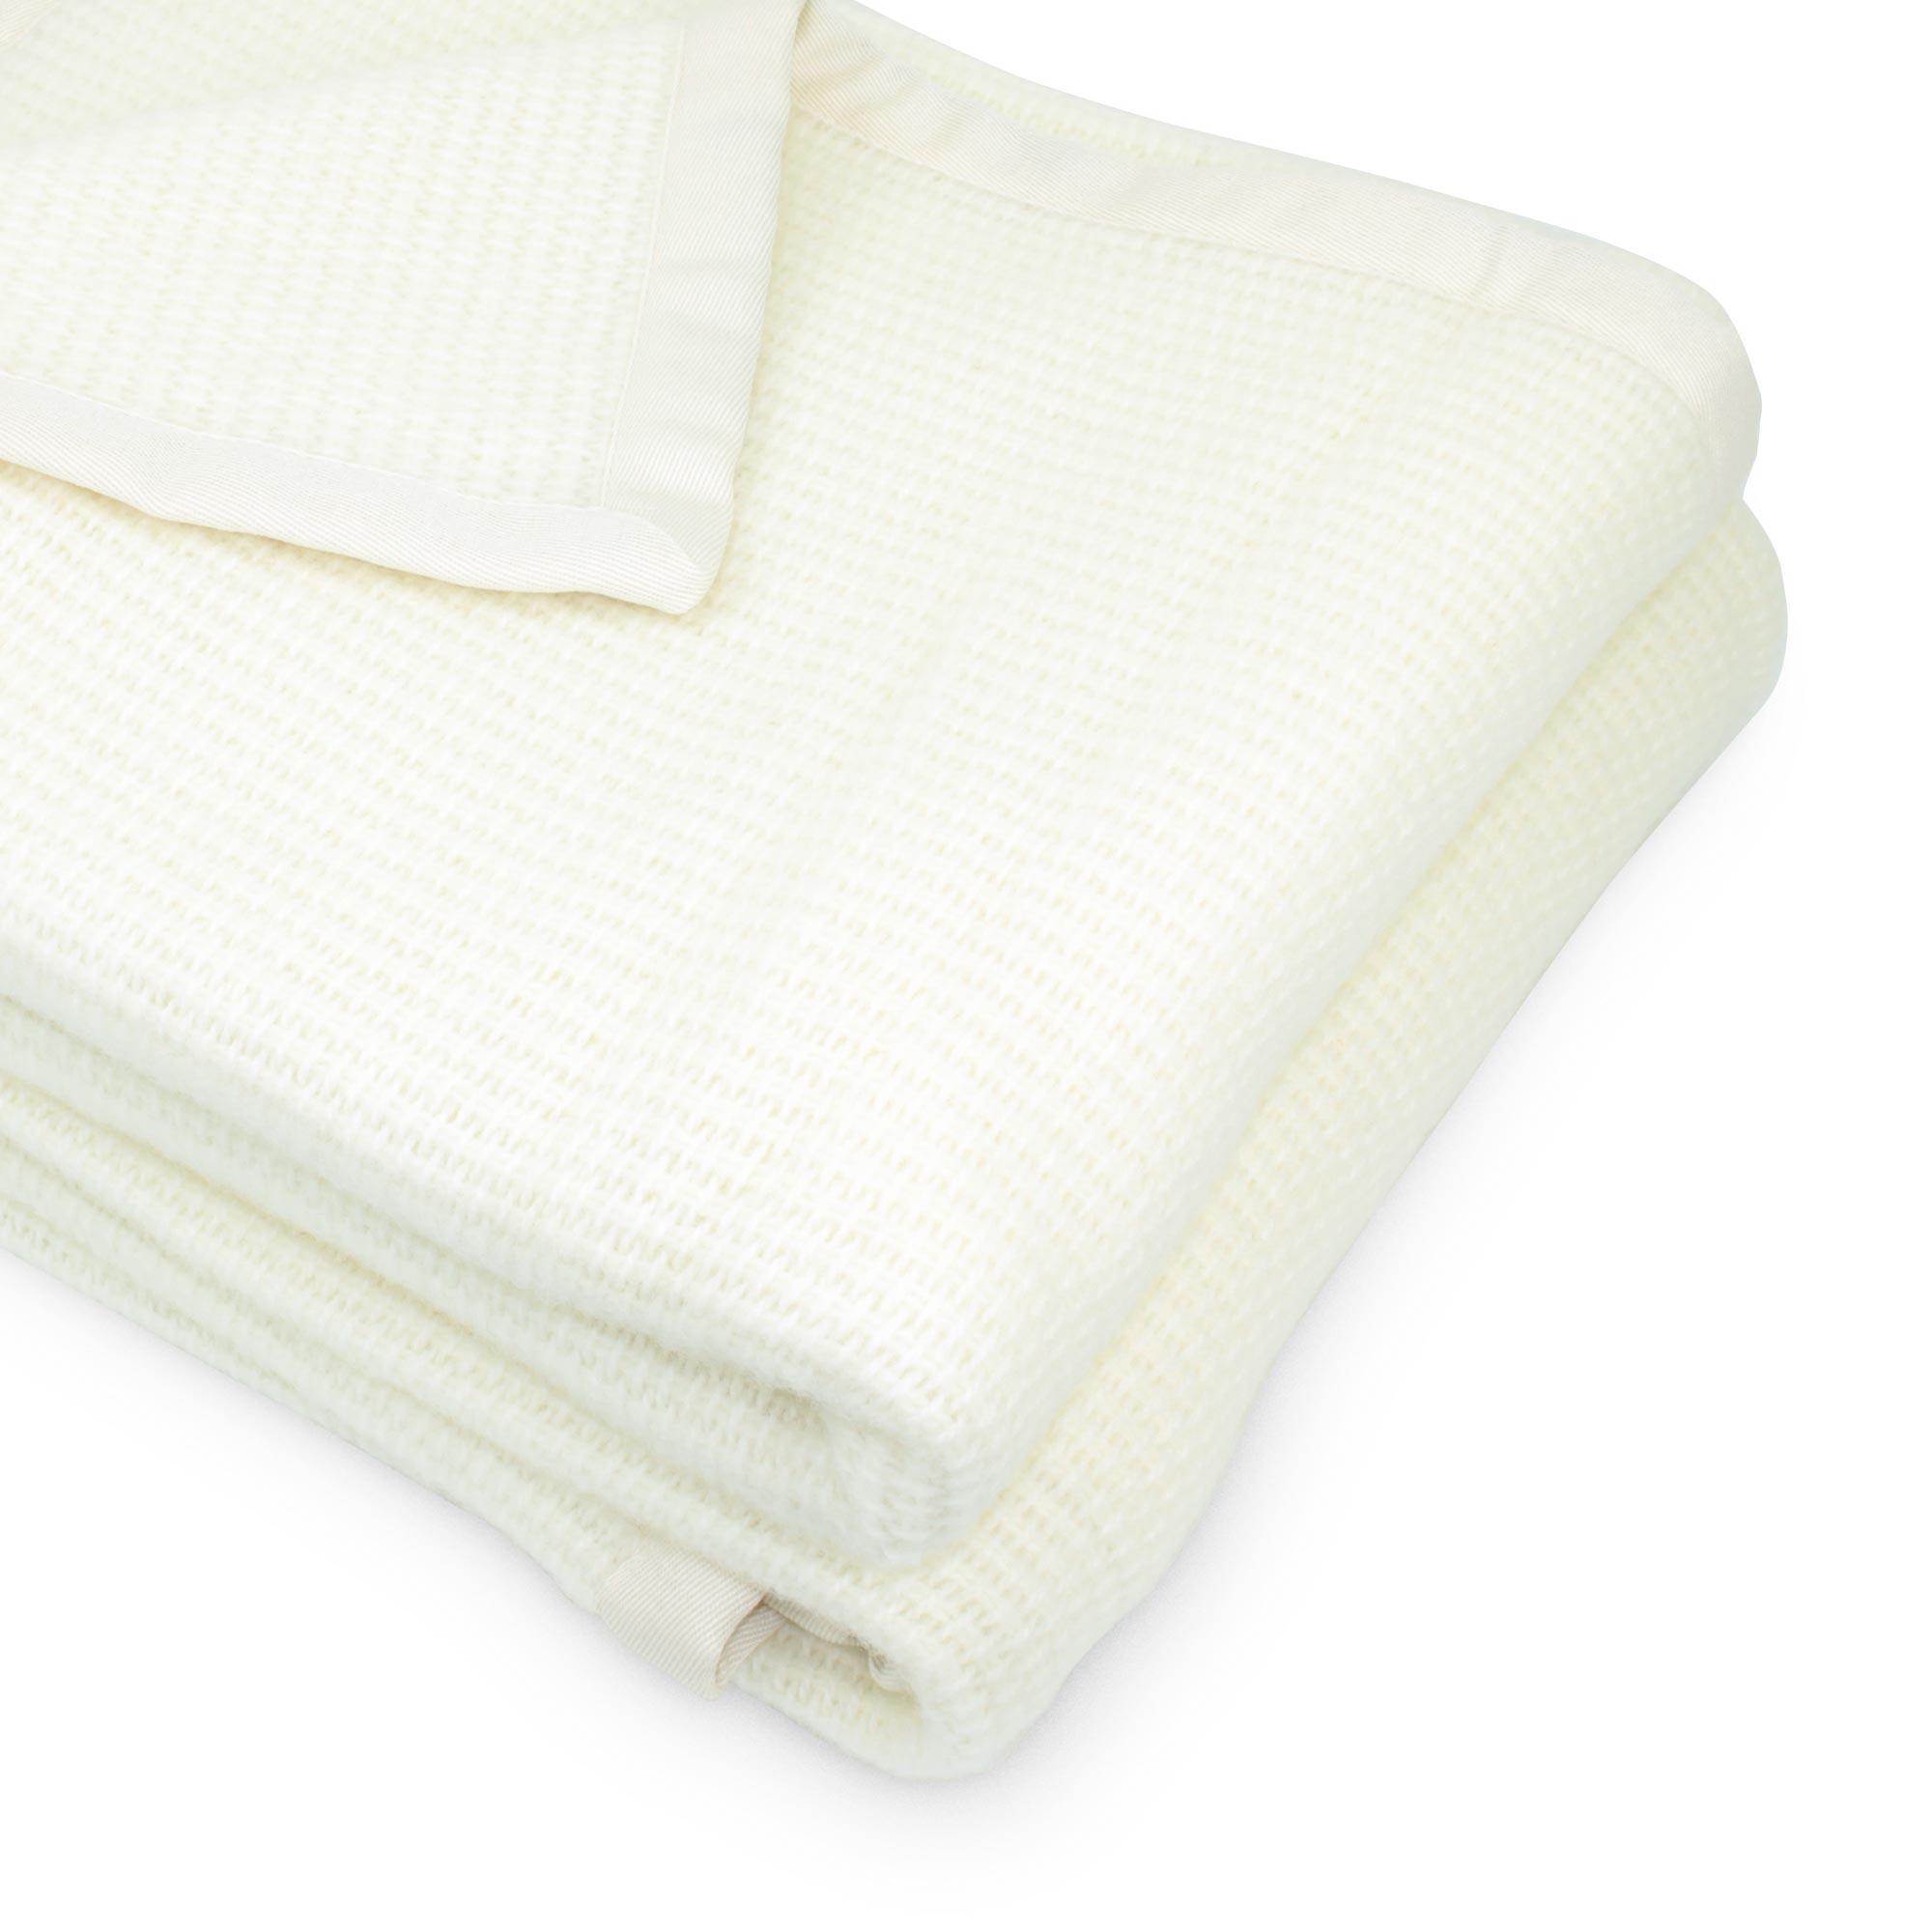 couverture 220x240 laine lambswool 280 g m adelaide blanc naturel ebay. Black Bedroom Furniture Sets. Home Design Ideas